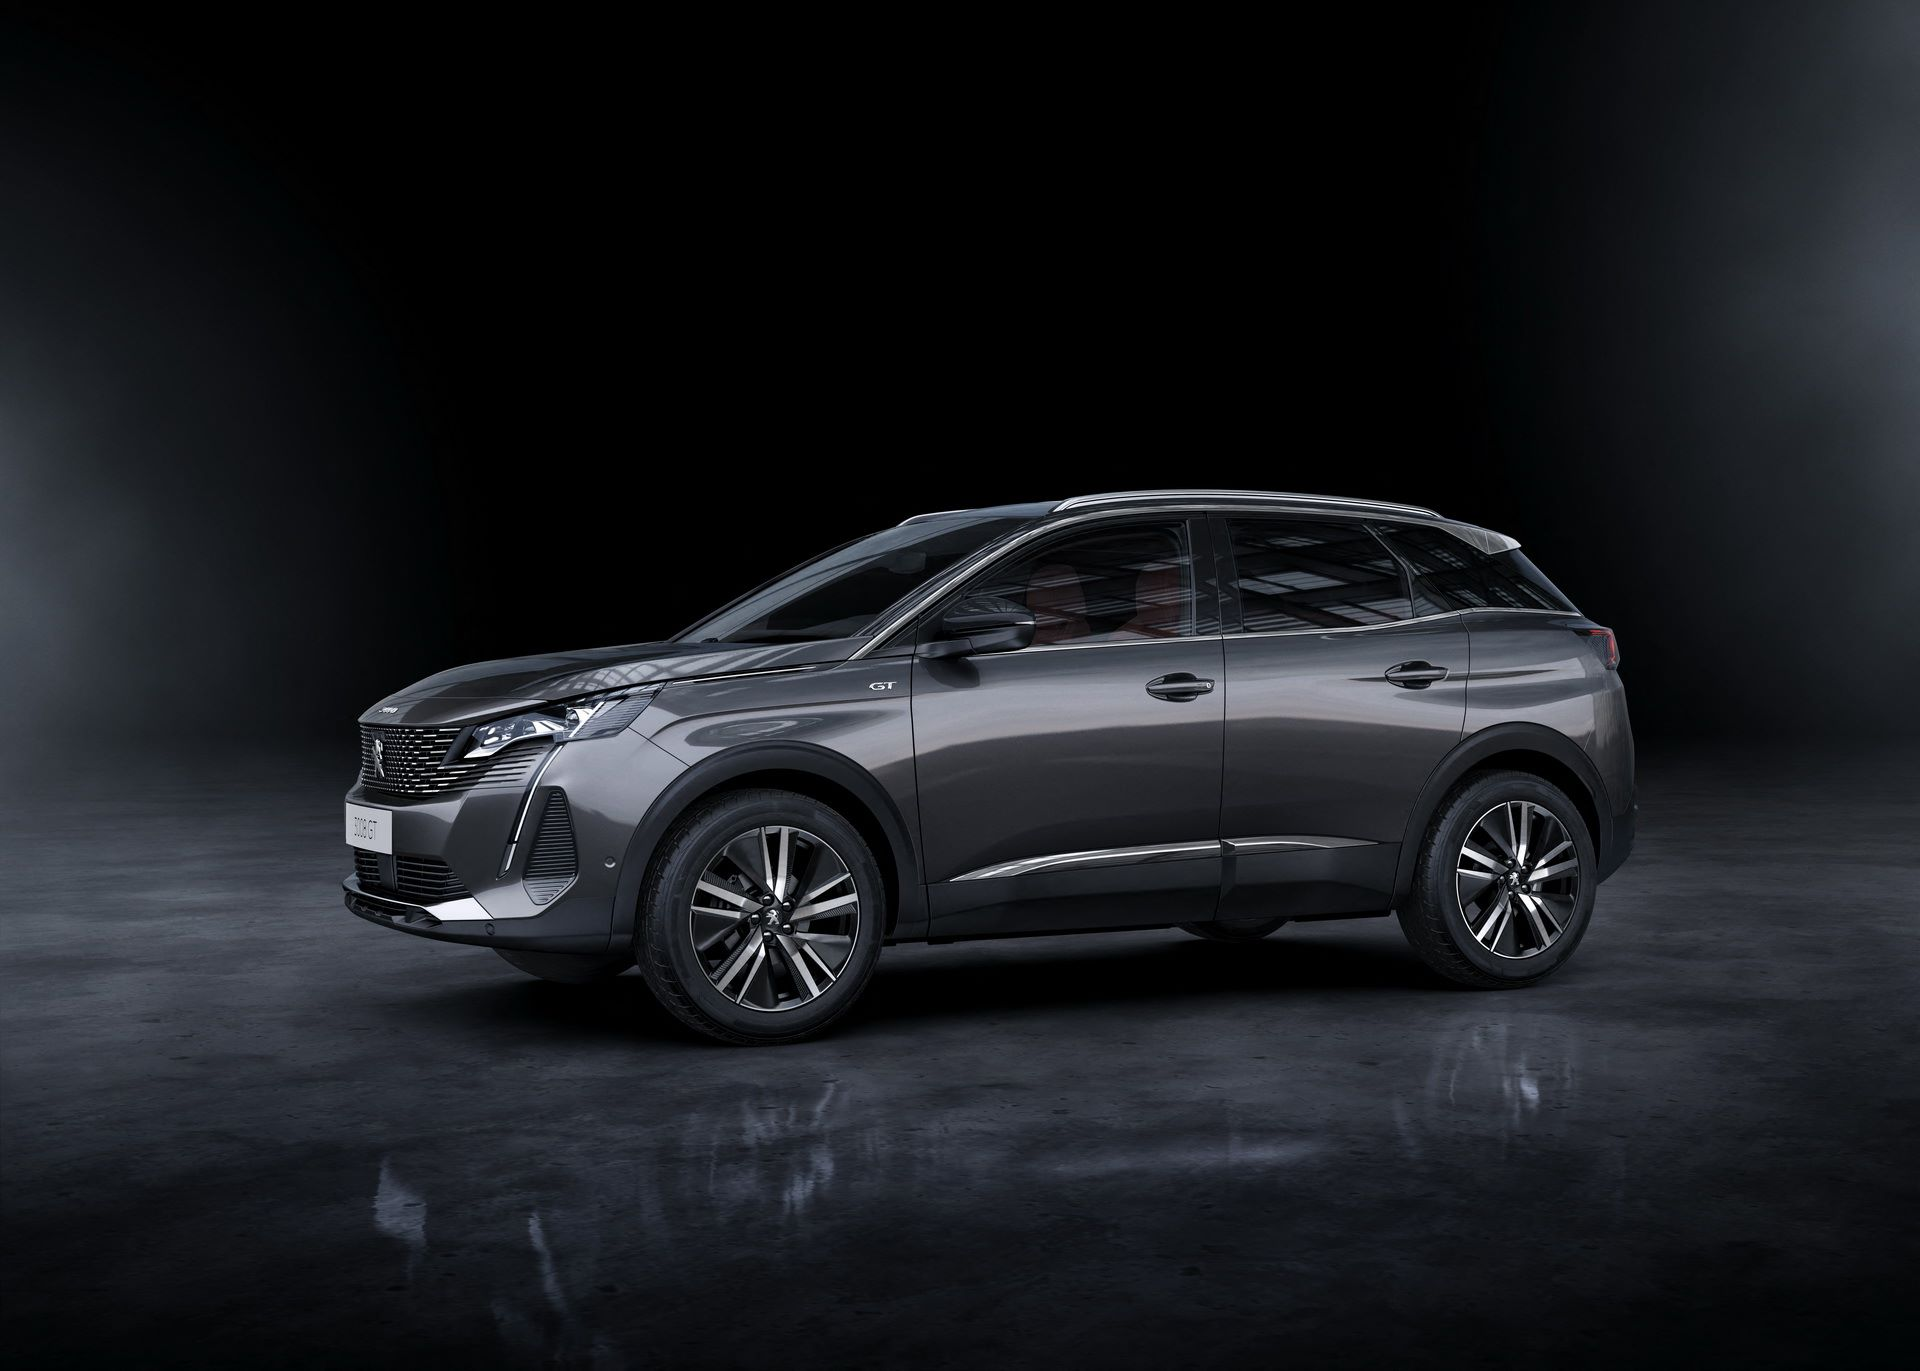 Peugeot-3008-facelift-2021-6